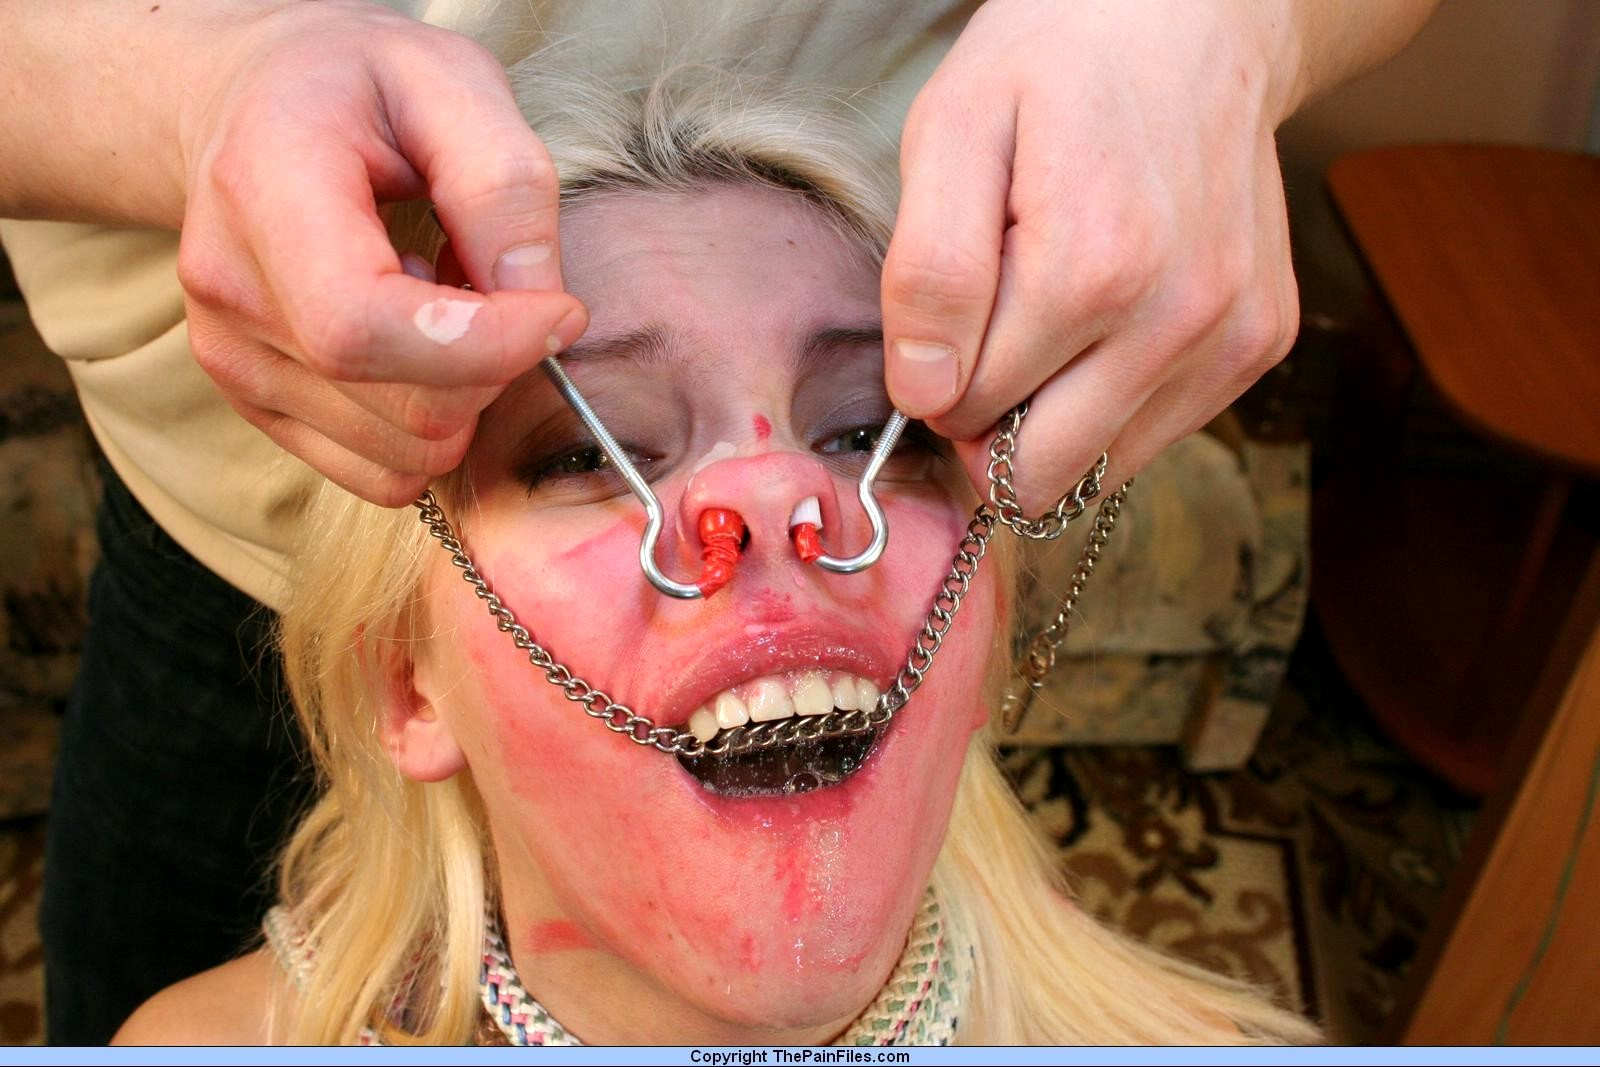 girl-porn-cum-nose-piercing